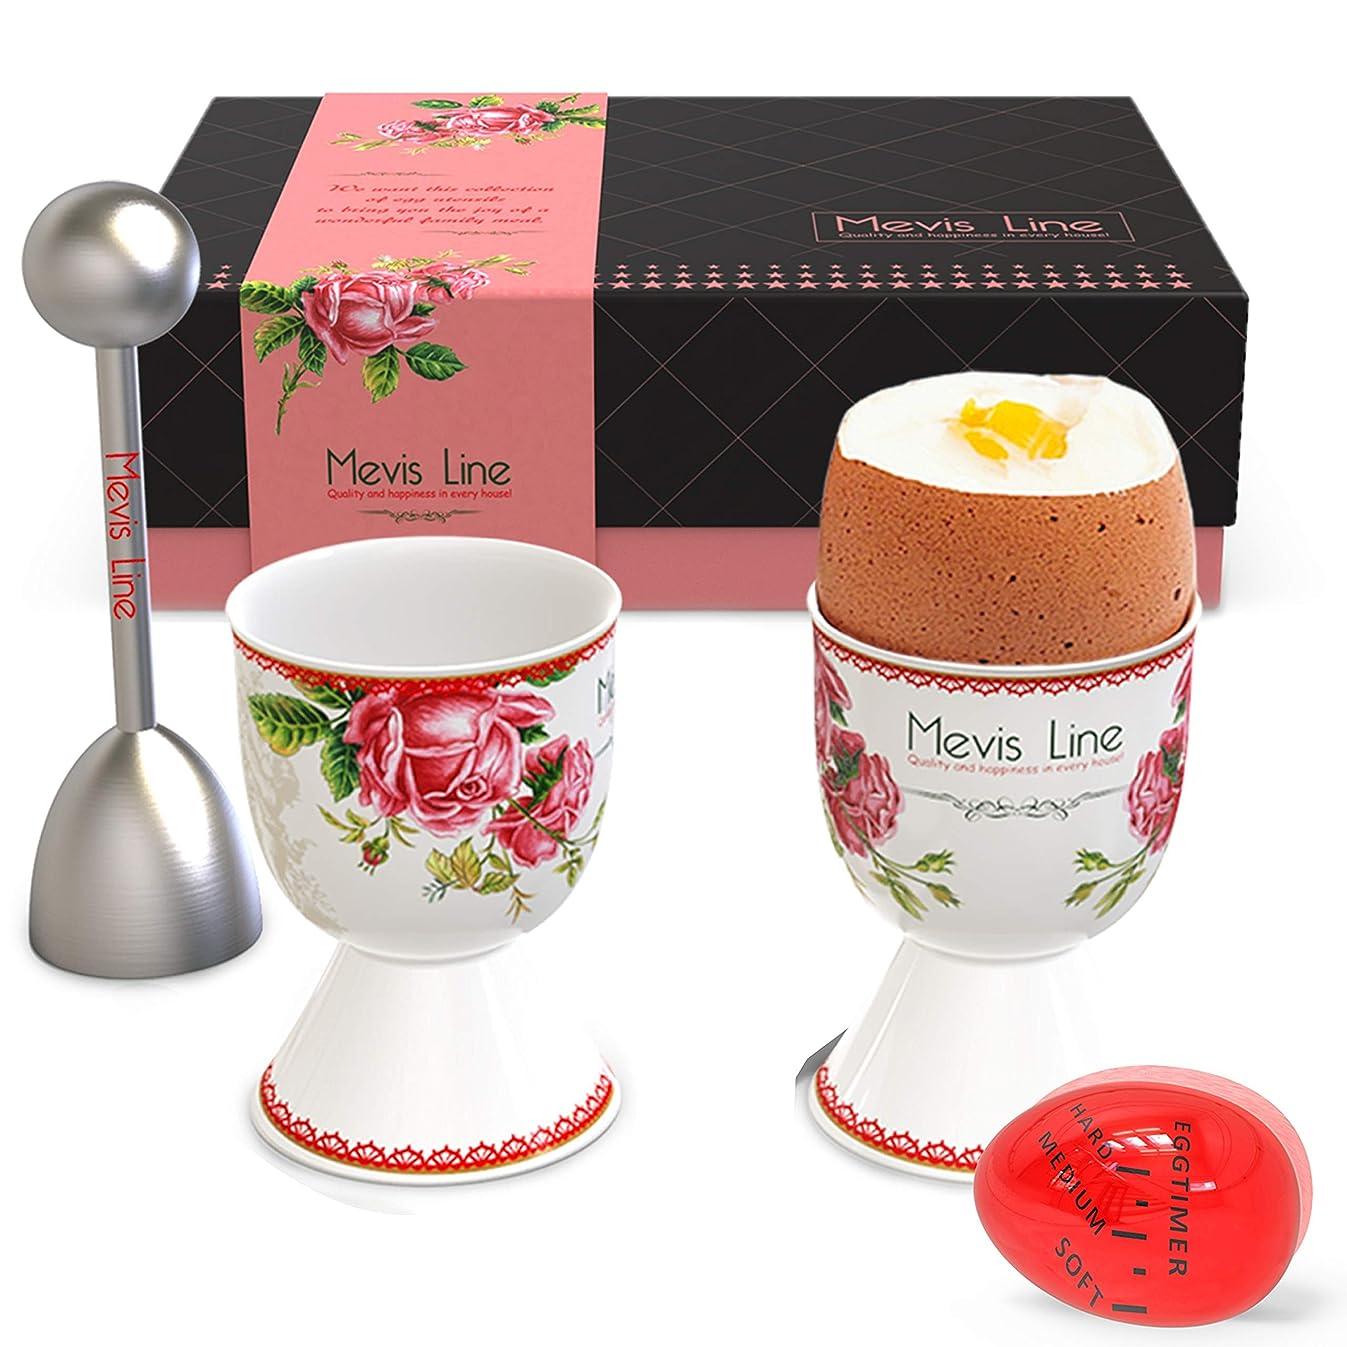 Mevis Line Egg Cups and Topper Cracker Set | Soft Hard Boiled Egg Cooker Tool | Includes 2 Eggs Holder With German Rose Design, 1 Egg Timer and 1 SS Egg Topper